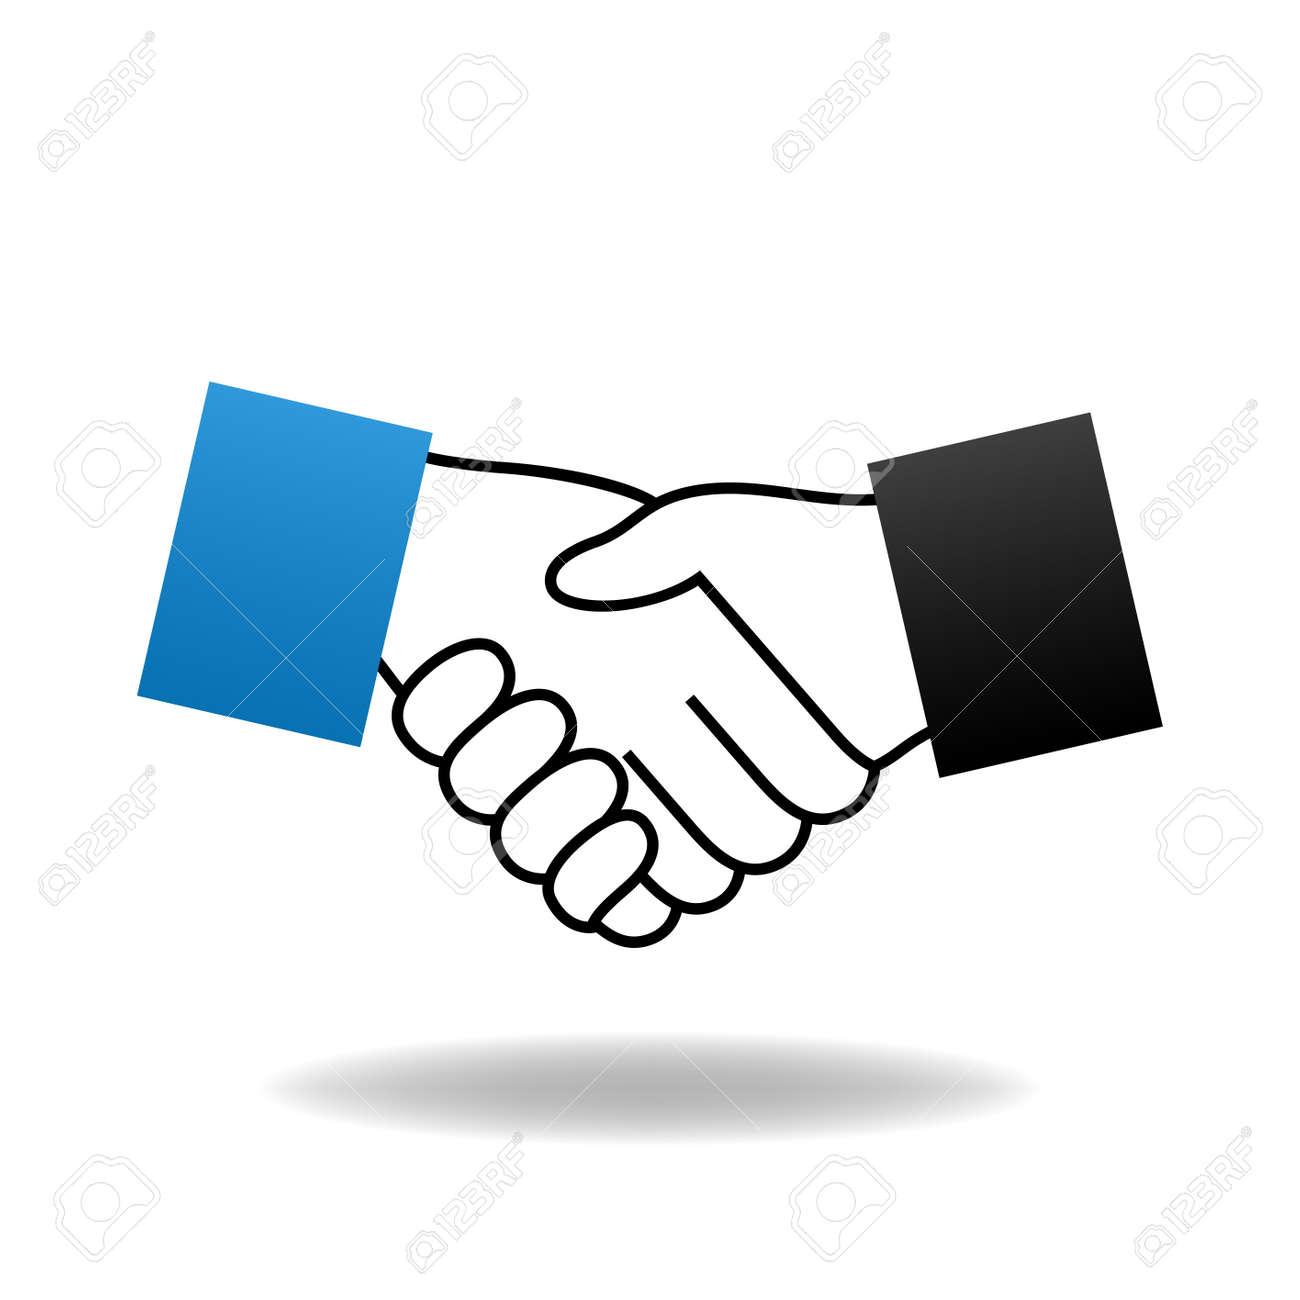 vector handshake icon royalty free cliparts vectors and stock rh 123rf com handshake vector icon free download handshaking vector